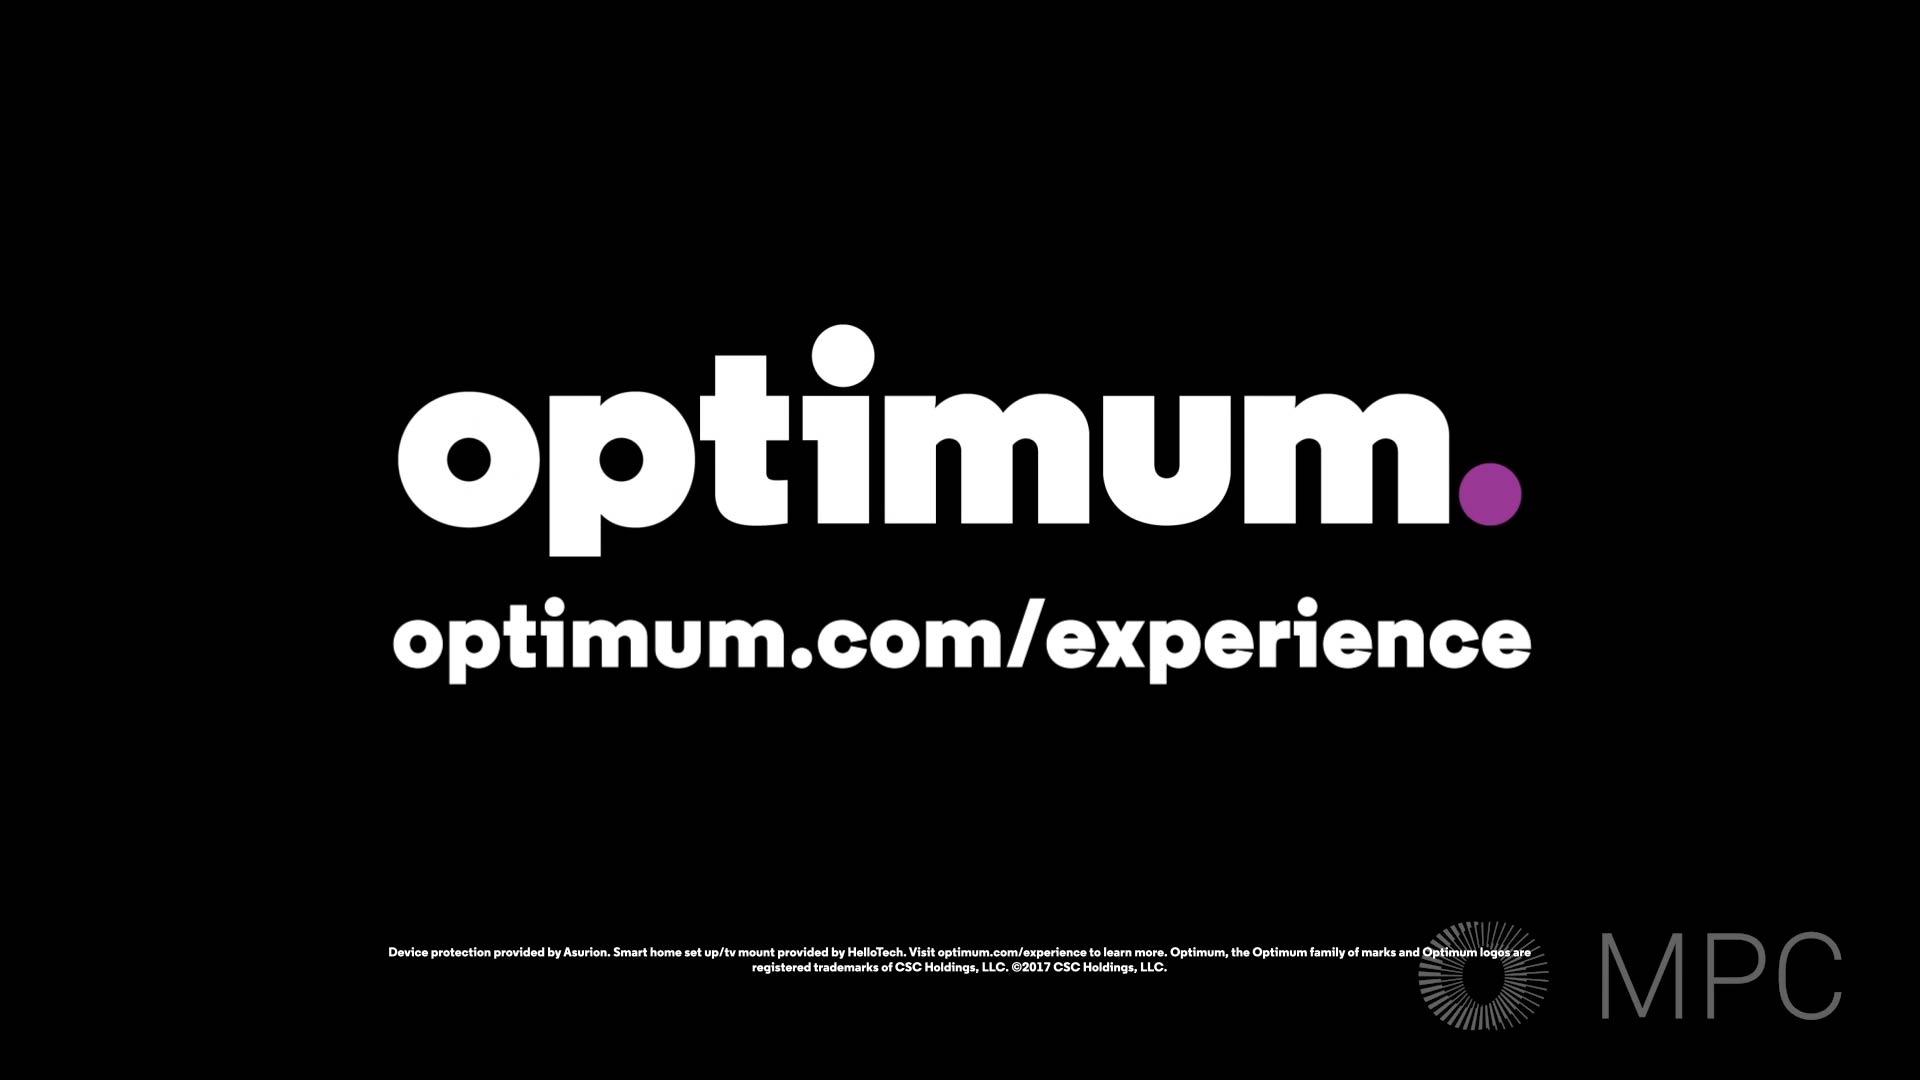 OPTIMUM_06.jpg